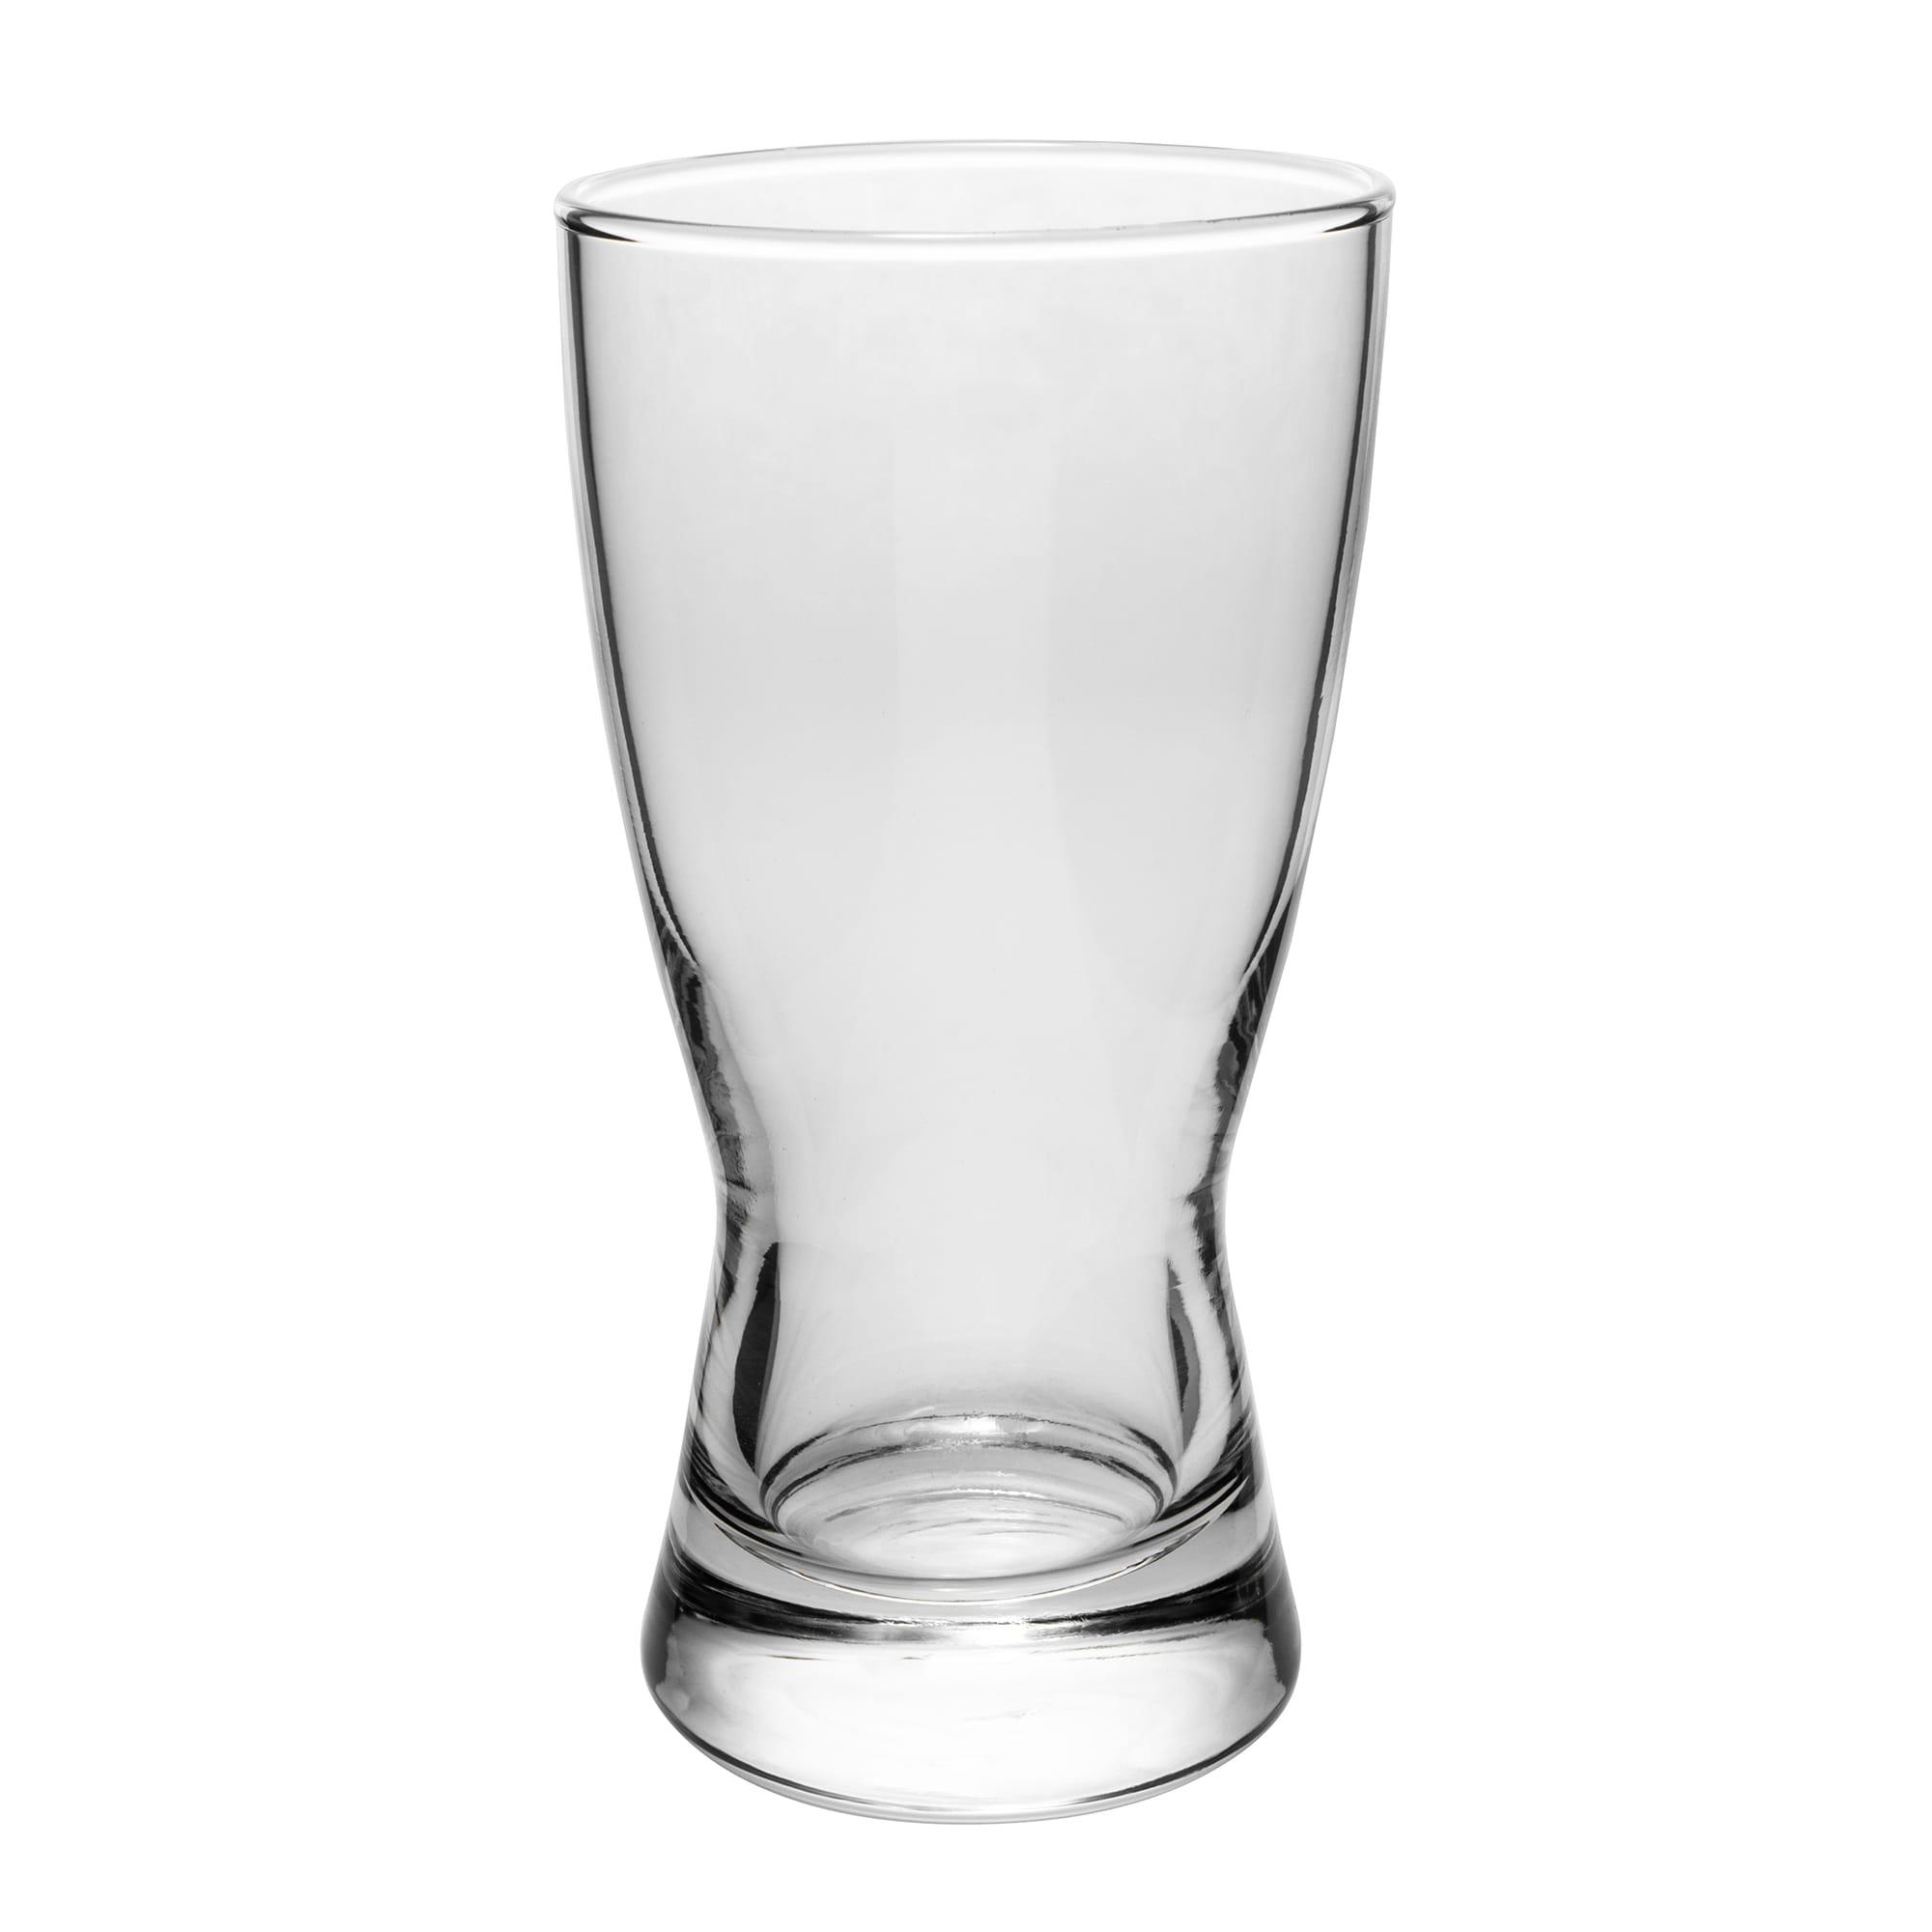 Libbey 176 9-oz Hourglass Design Pilsner Glass - Safedge Rim Guarantee